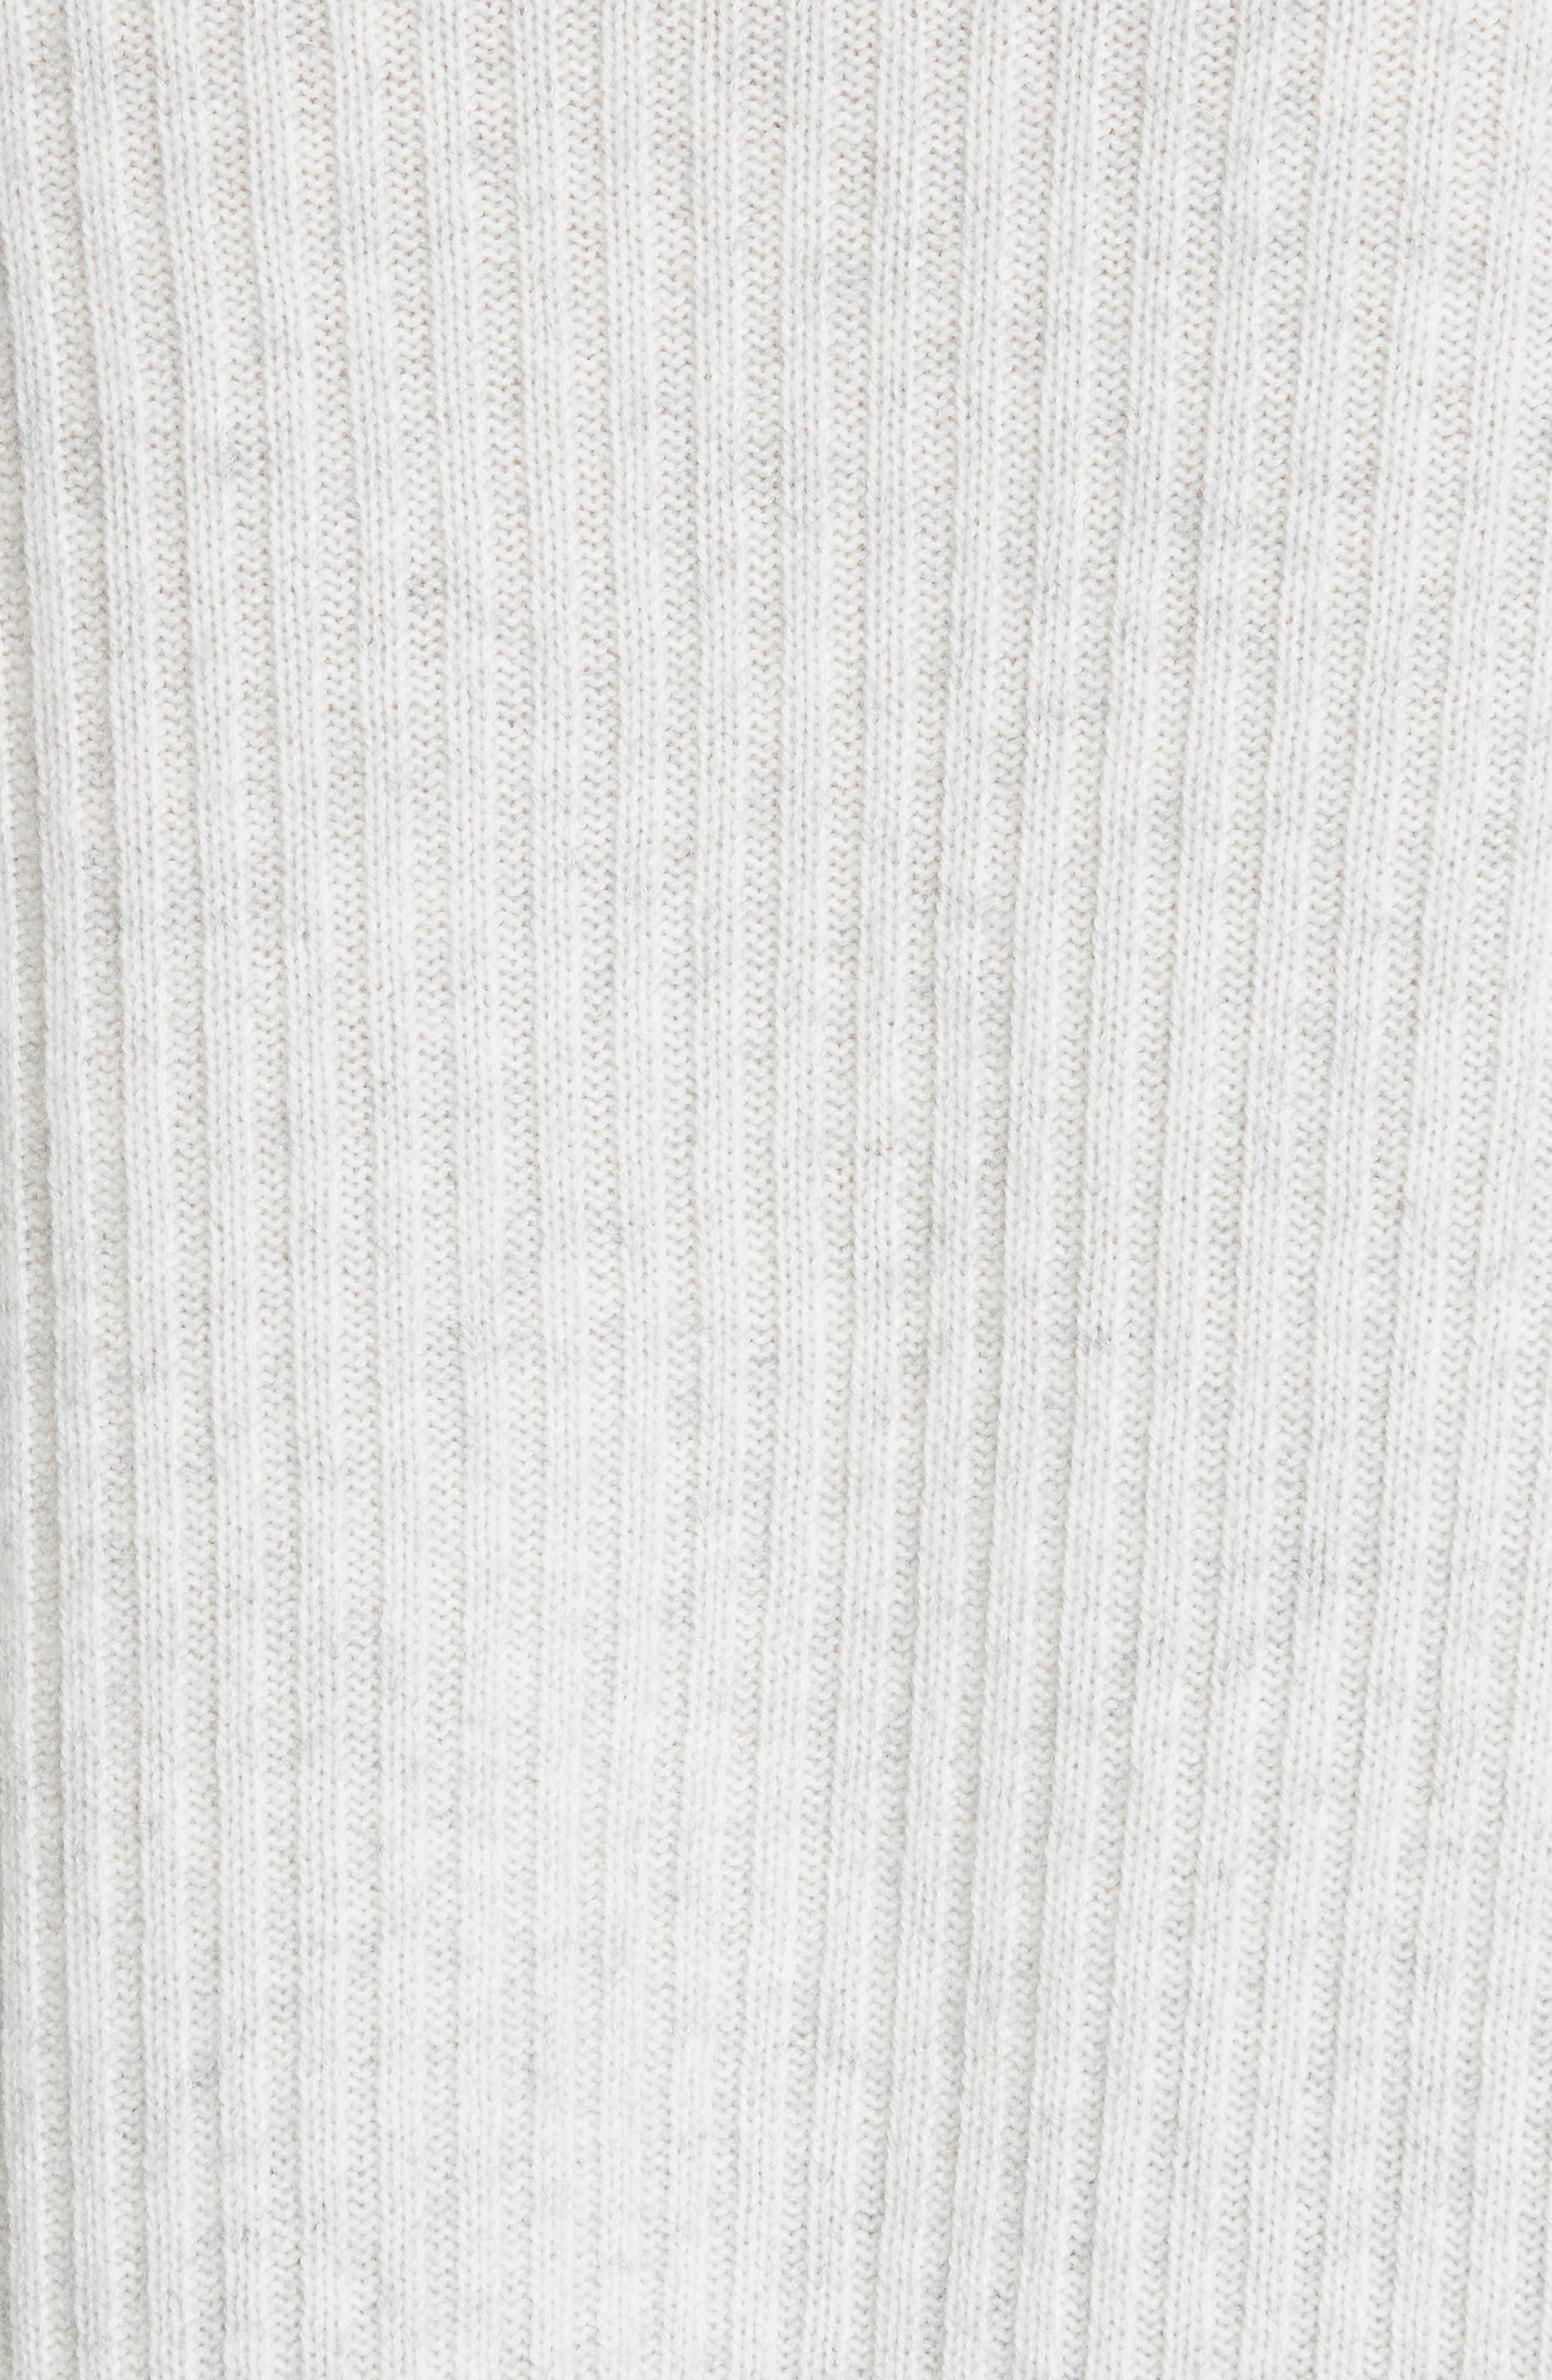 Ribbed Bateau Neck Sweater,                             Alternate thumbnail 5, color,                             HEATHER CLOUD